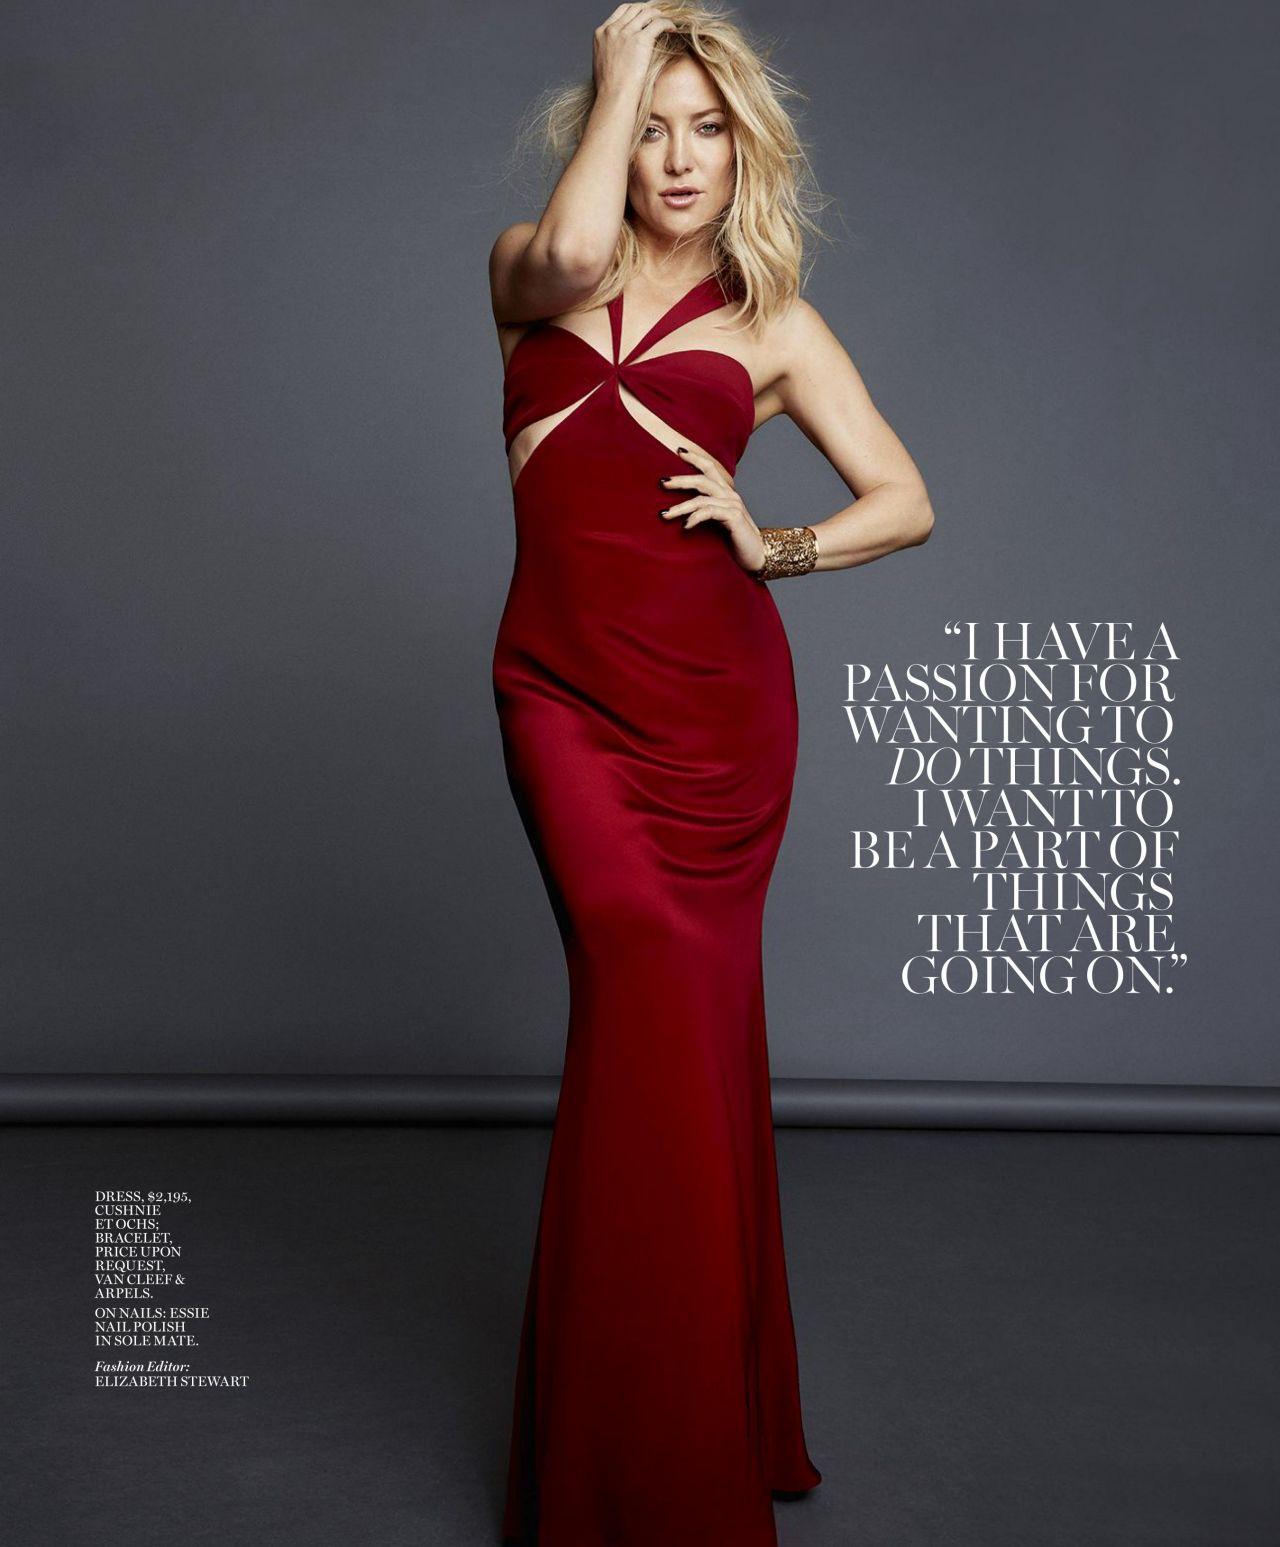 Kate Hudson photo gallery - page #7 | Celebs-Place.com